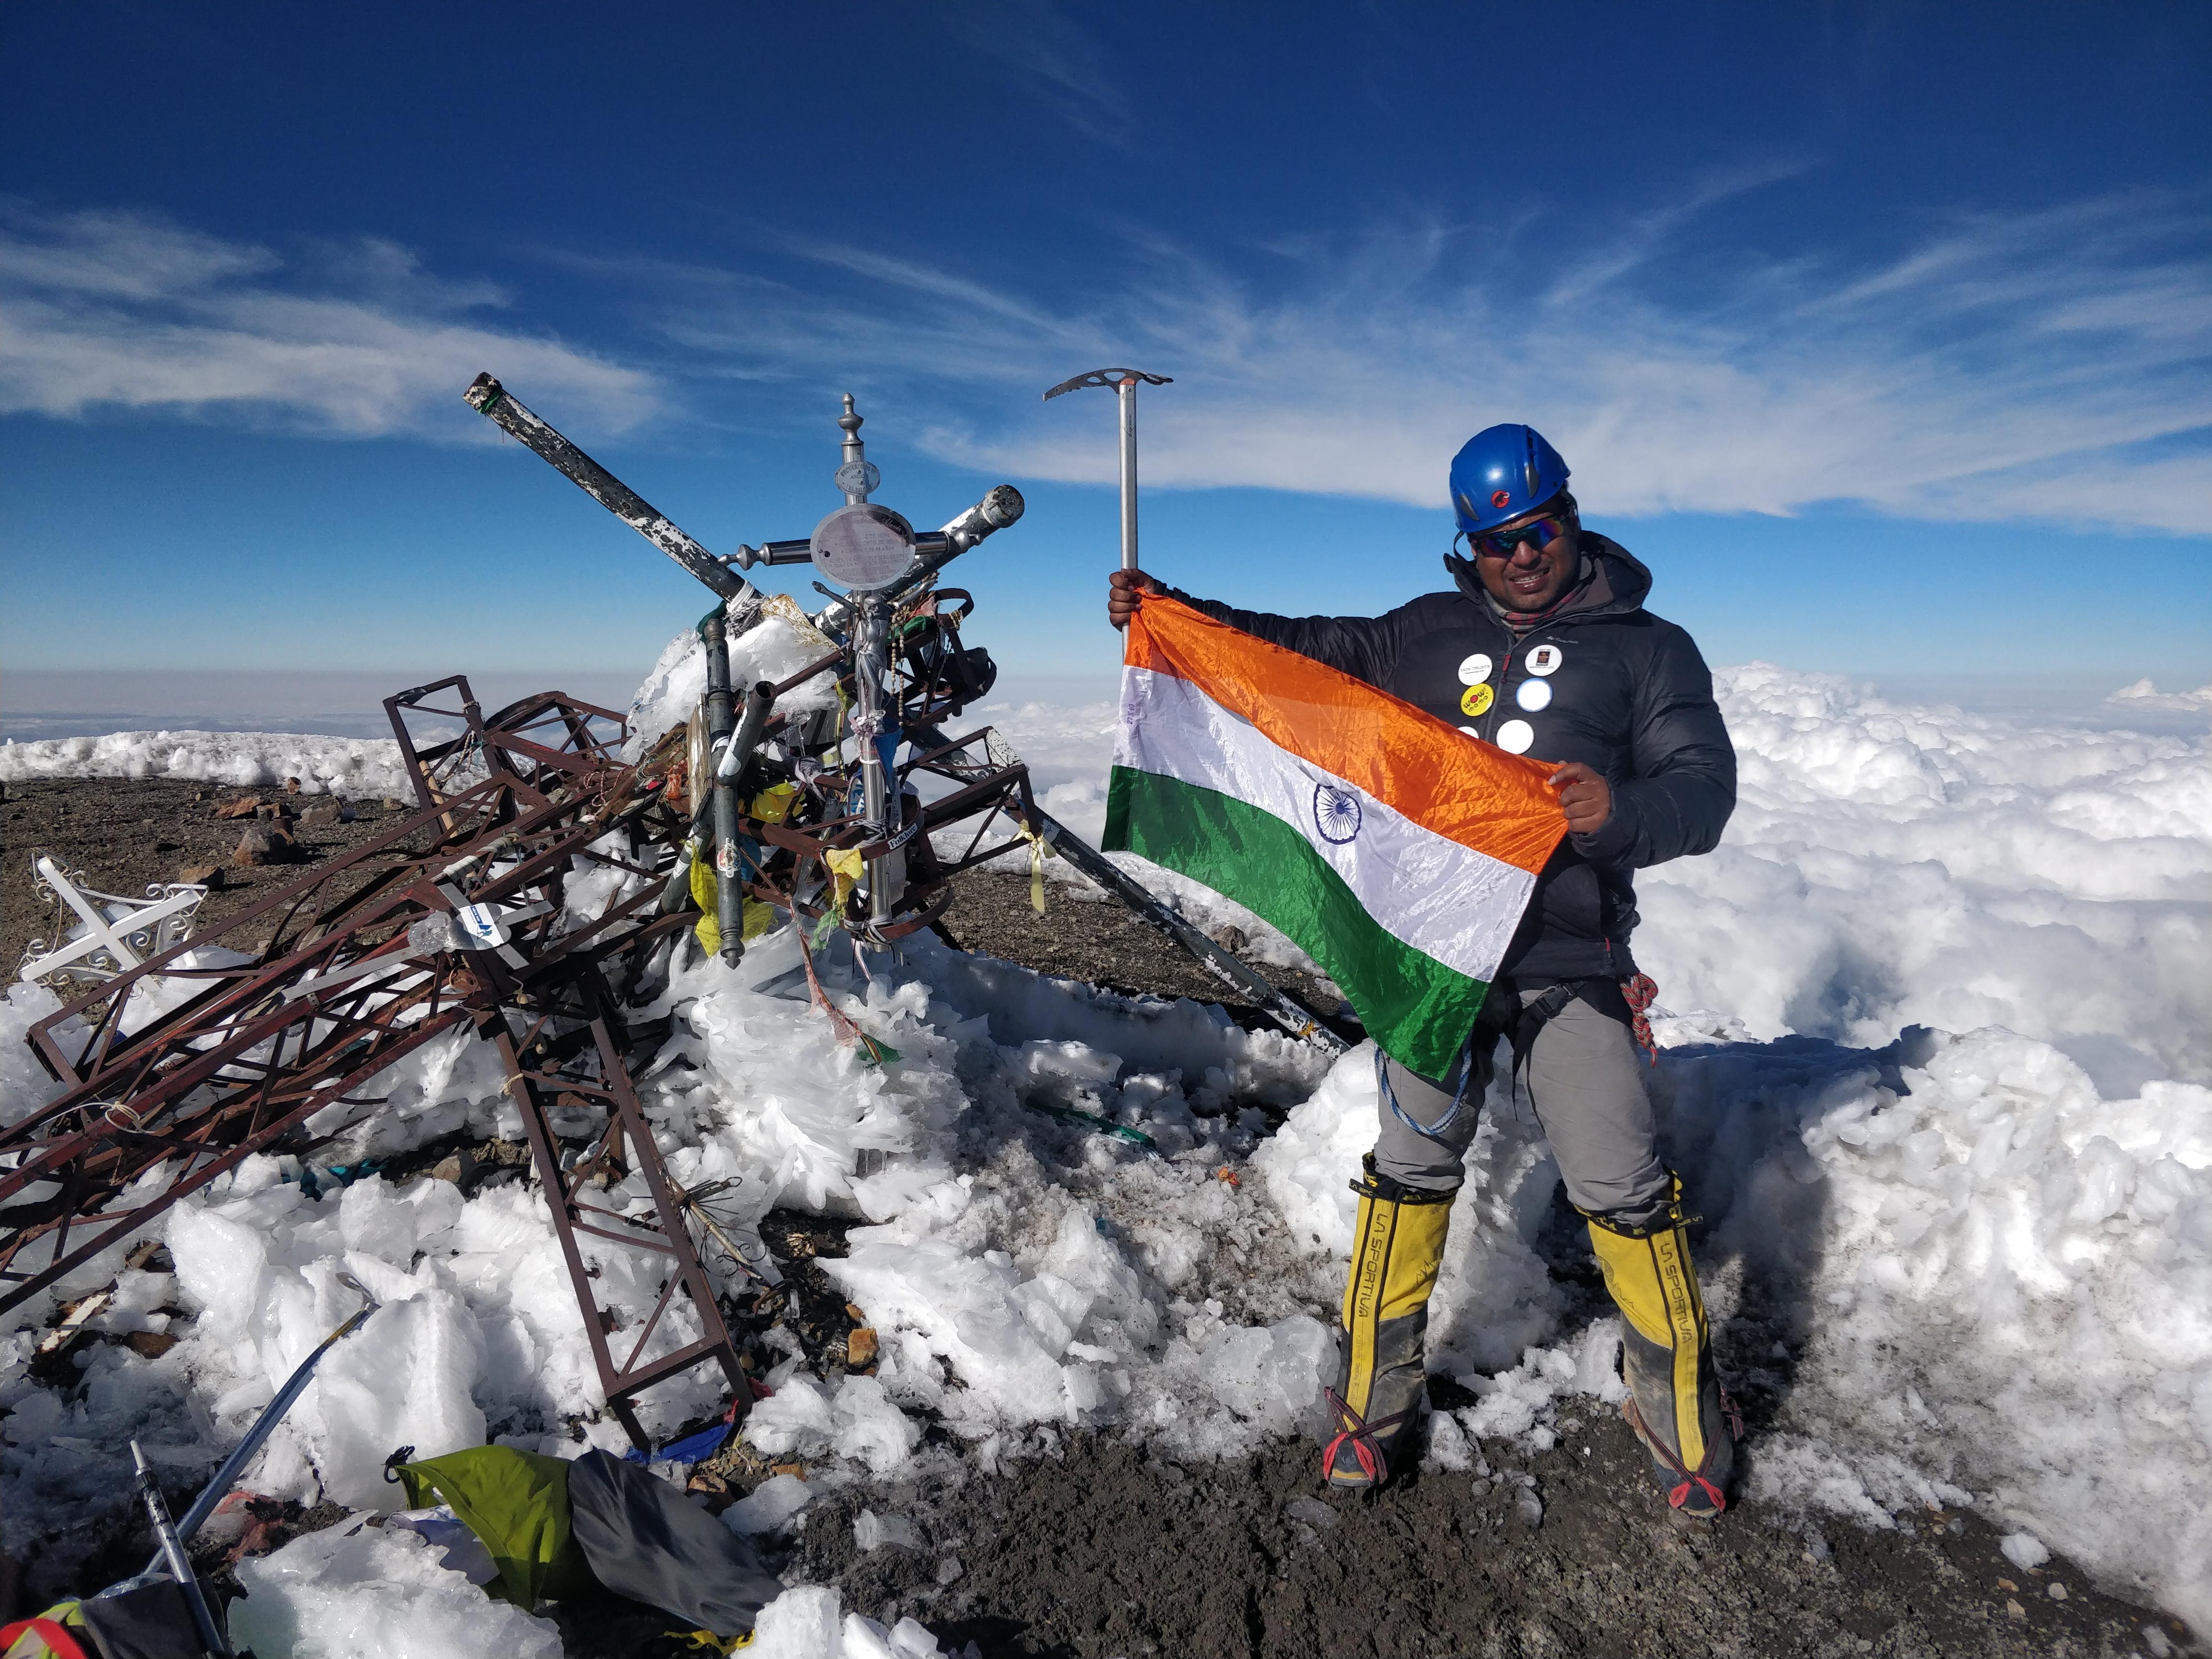 Satyarup Siddhanta on Pico de Orizaba - December 2018